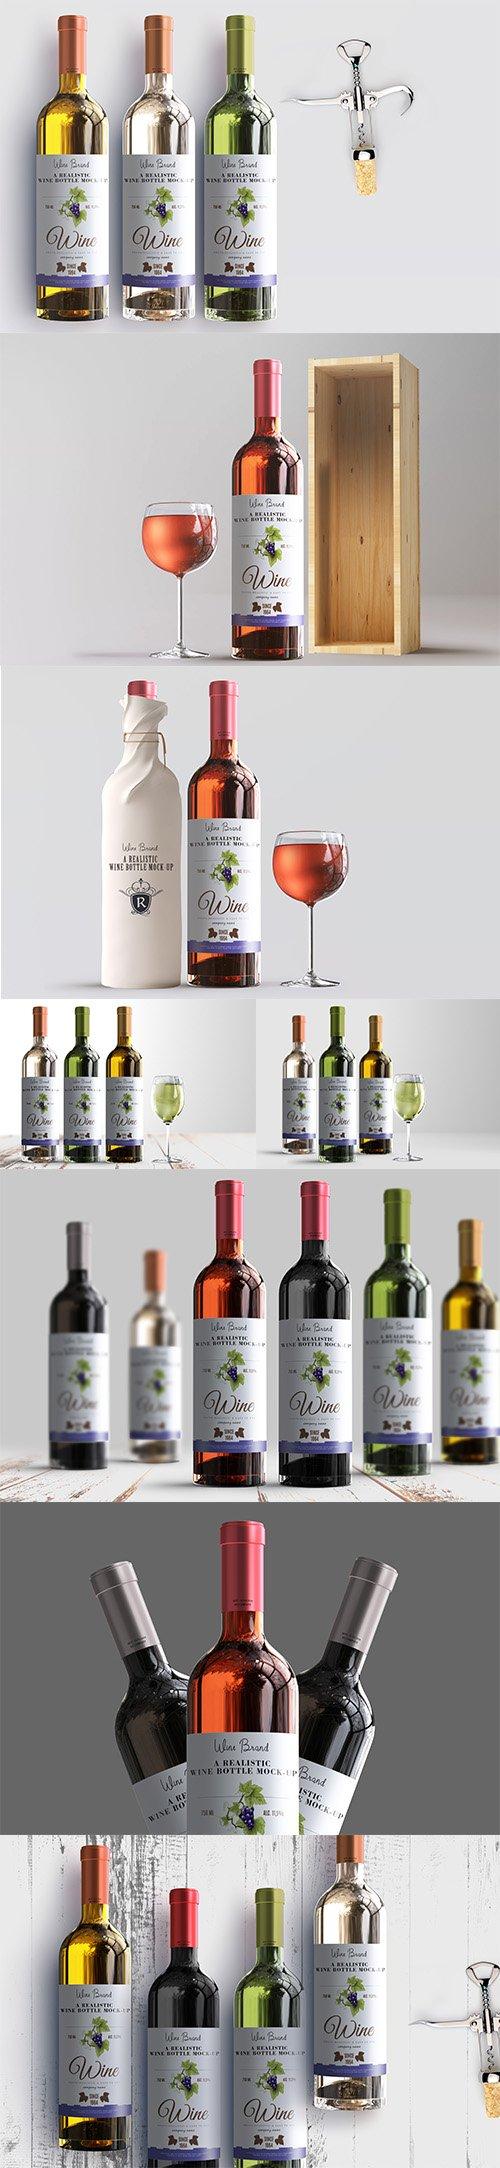 Realistic Wine Bottle Label Mockup PSD Pack